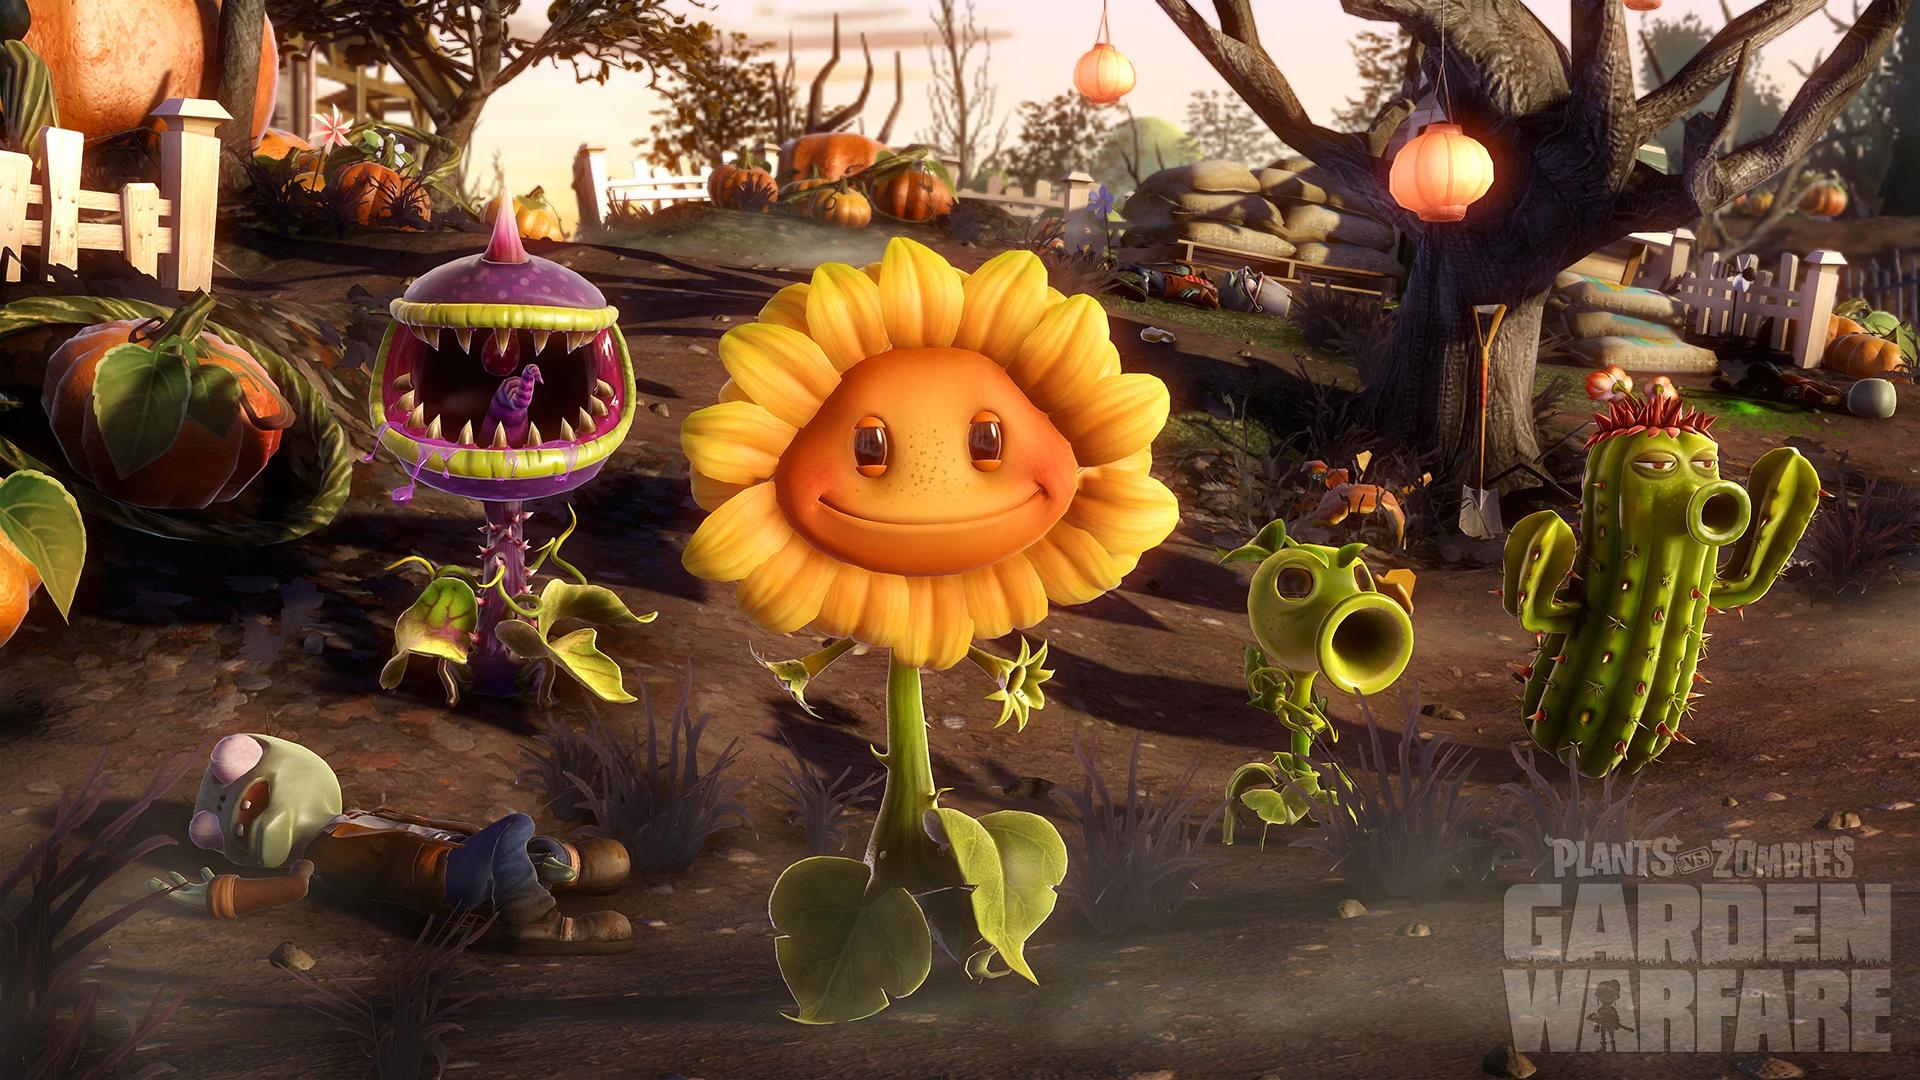 Plants vs. zombies как сделать на весь экран